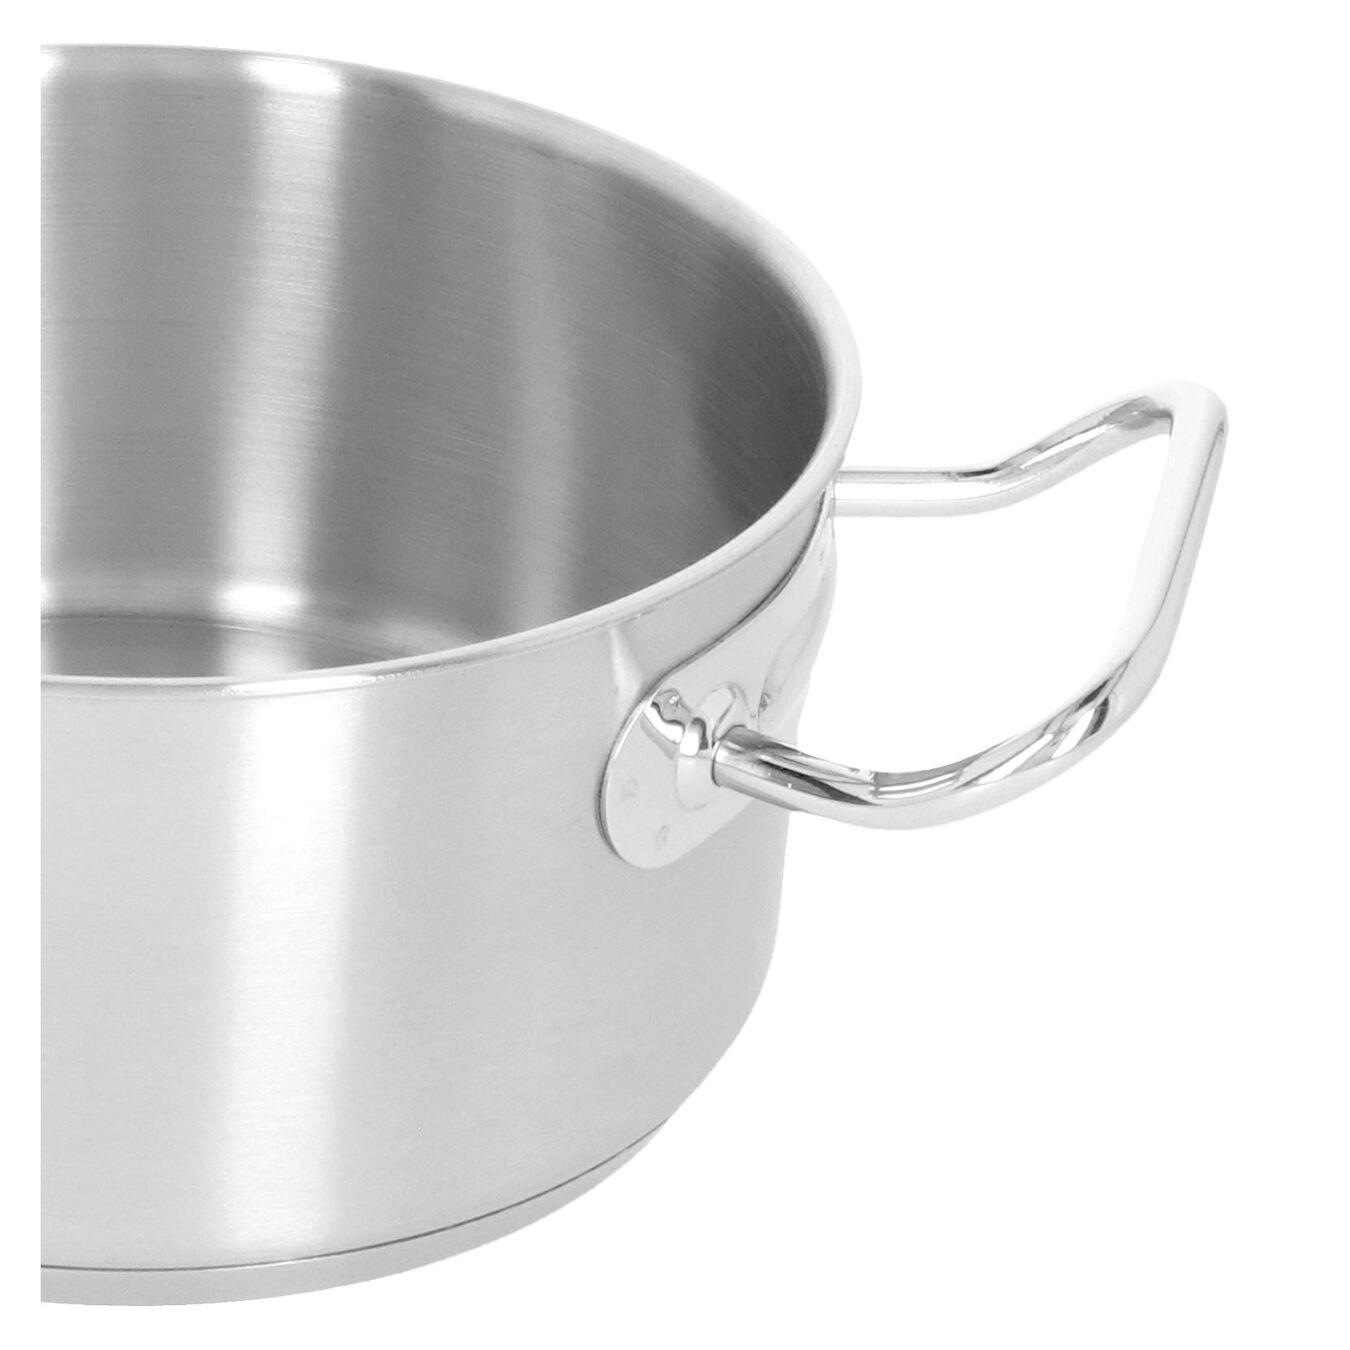 Kookpot met deksel 18 cm / 2 l,,large 4